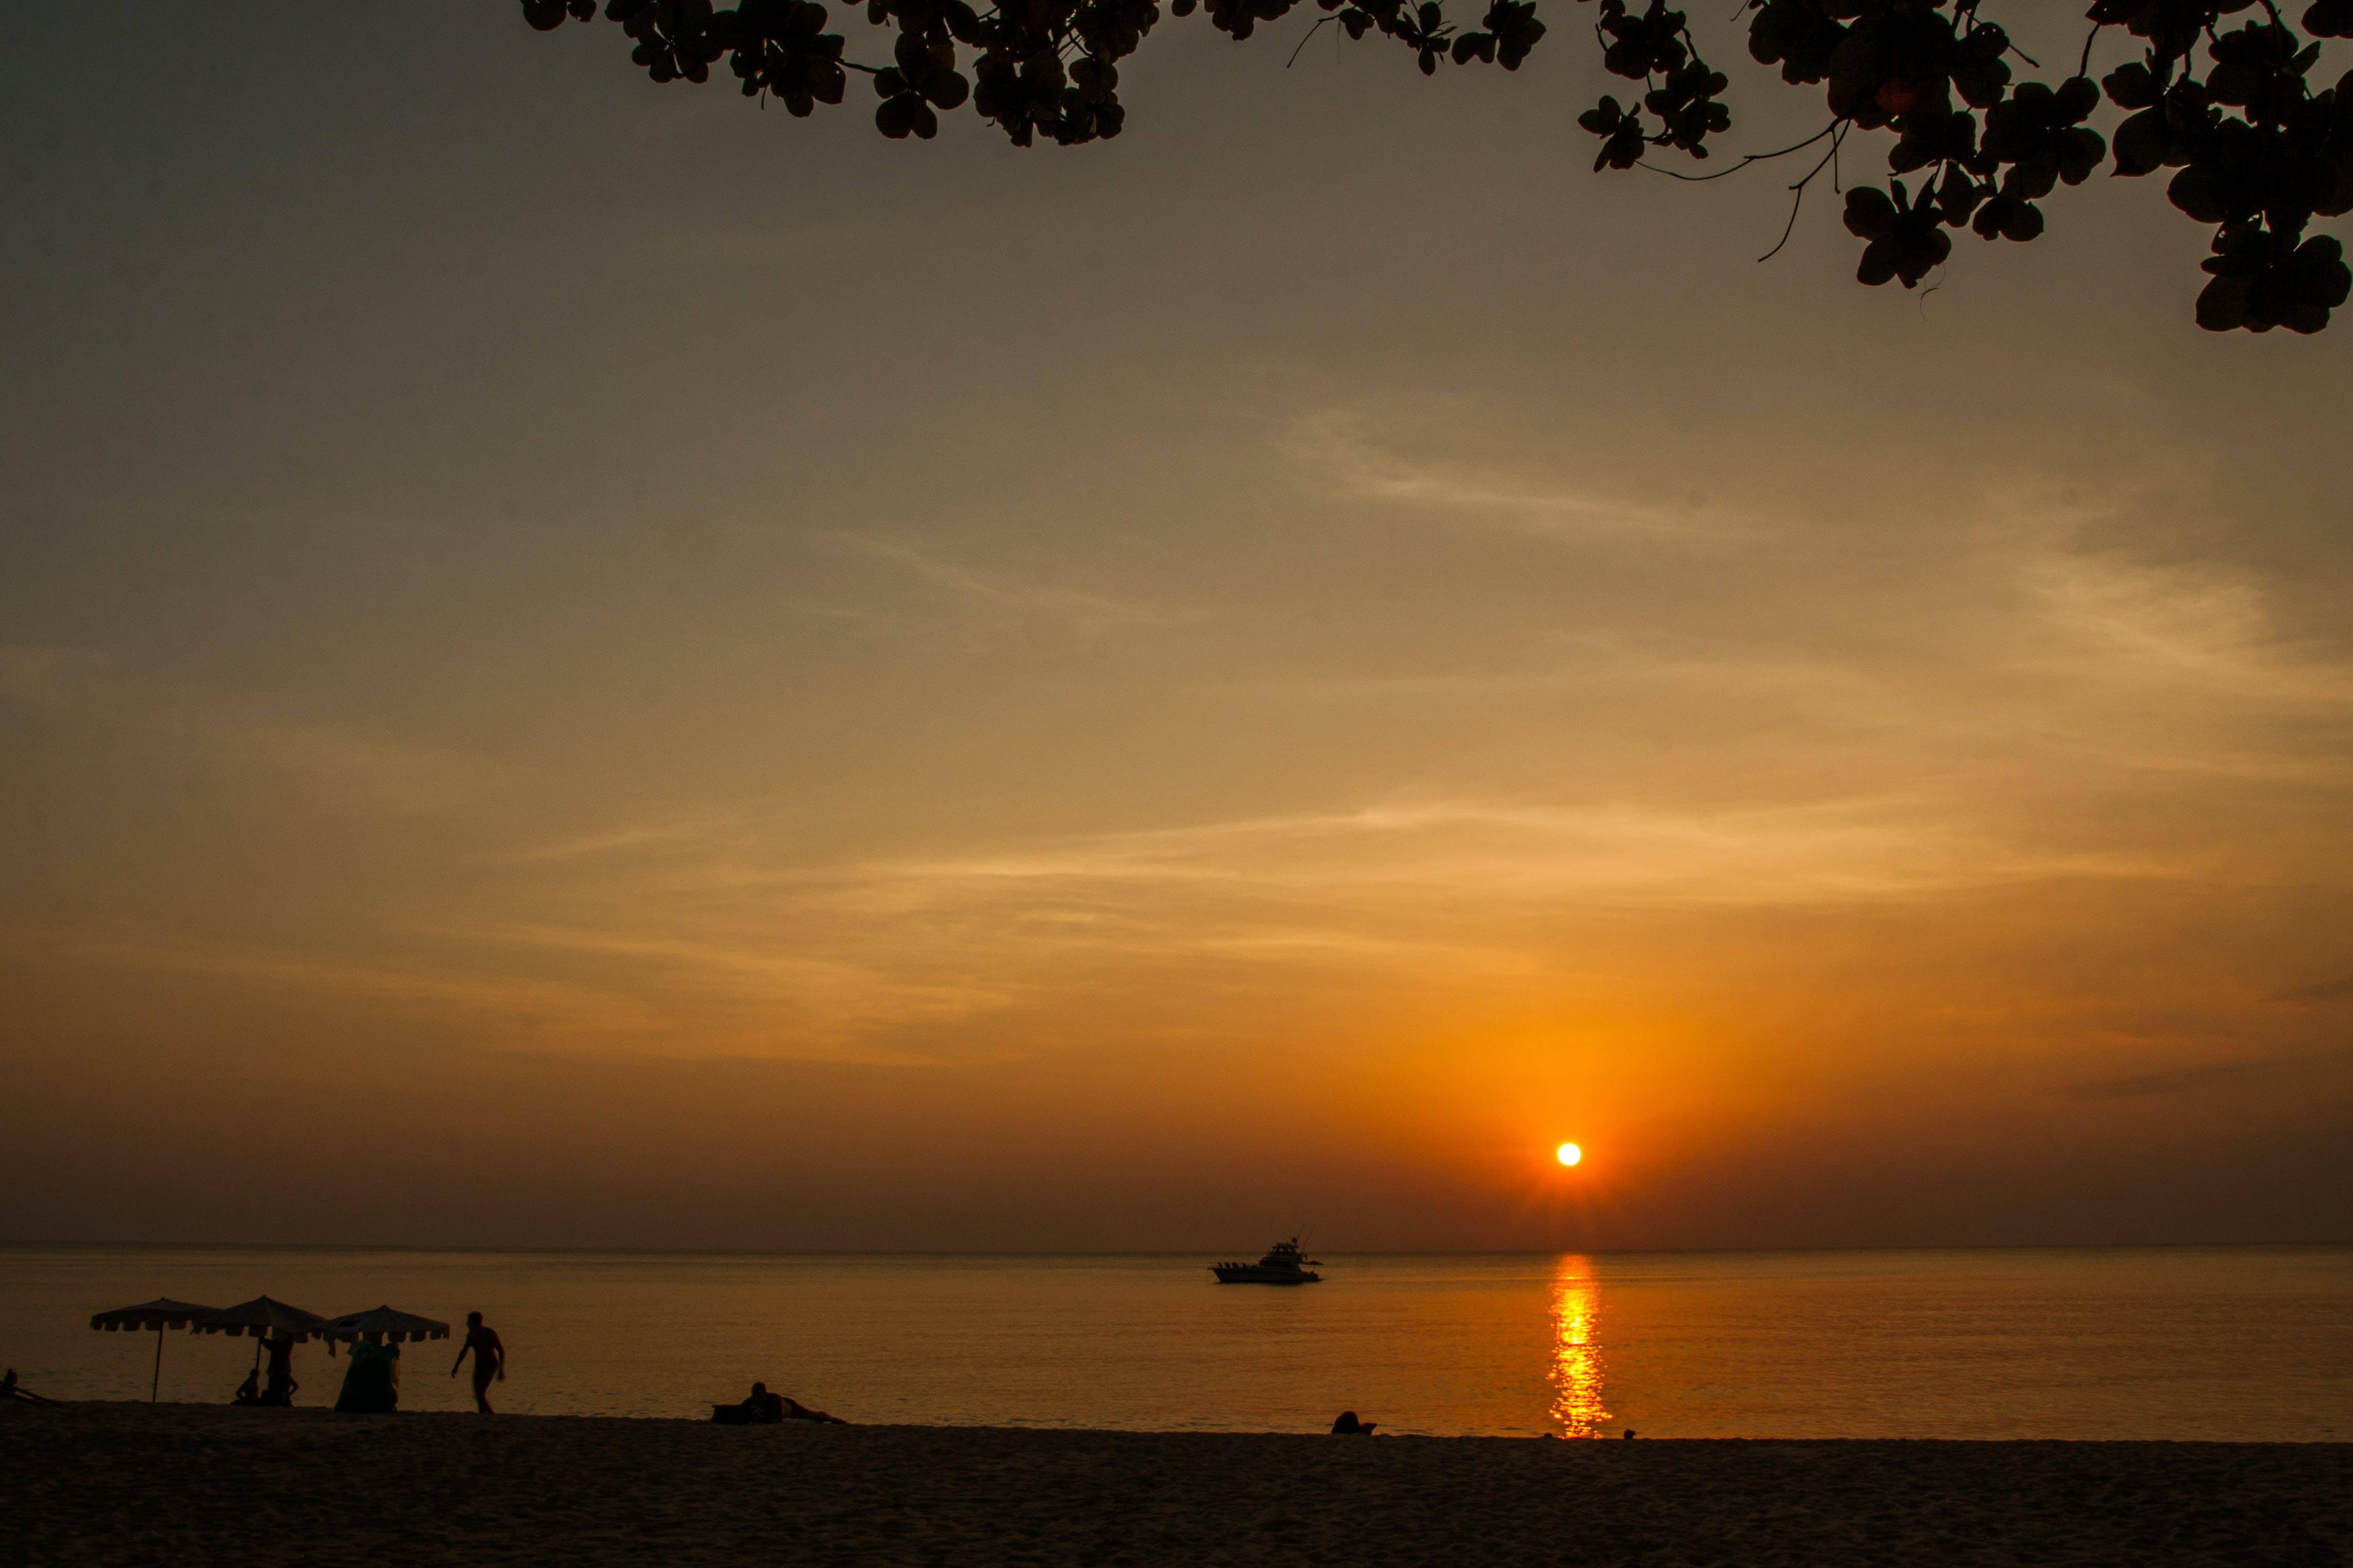 Free stock photo of beach, holidays, mirophotography.wordpress.com, sun